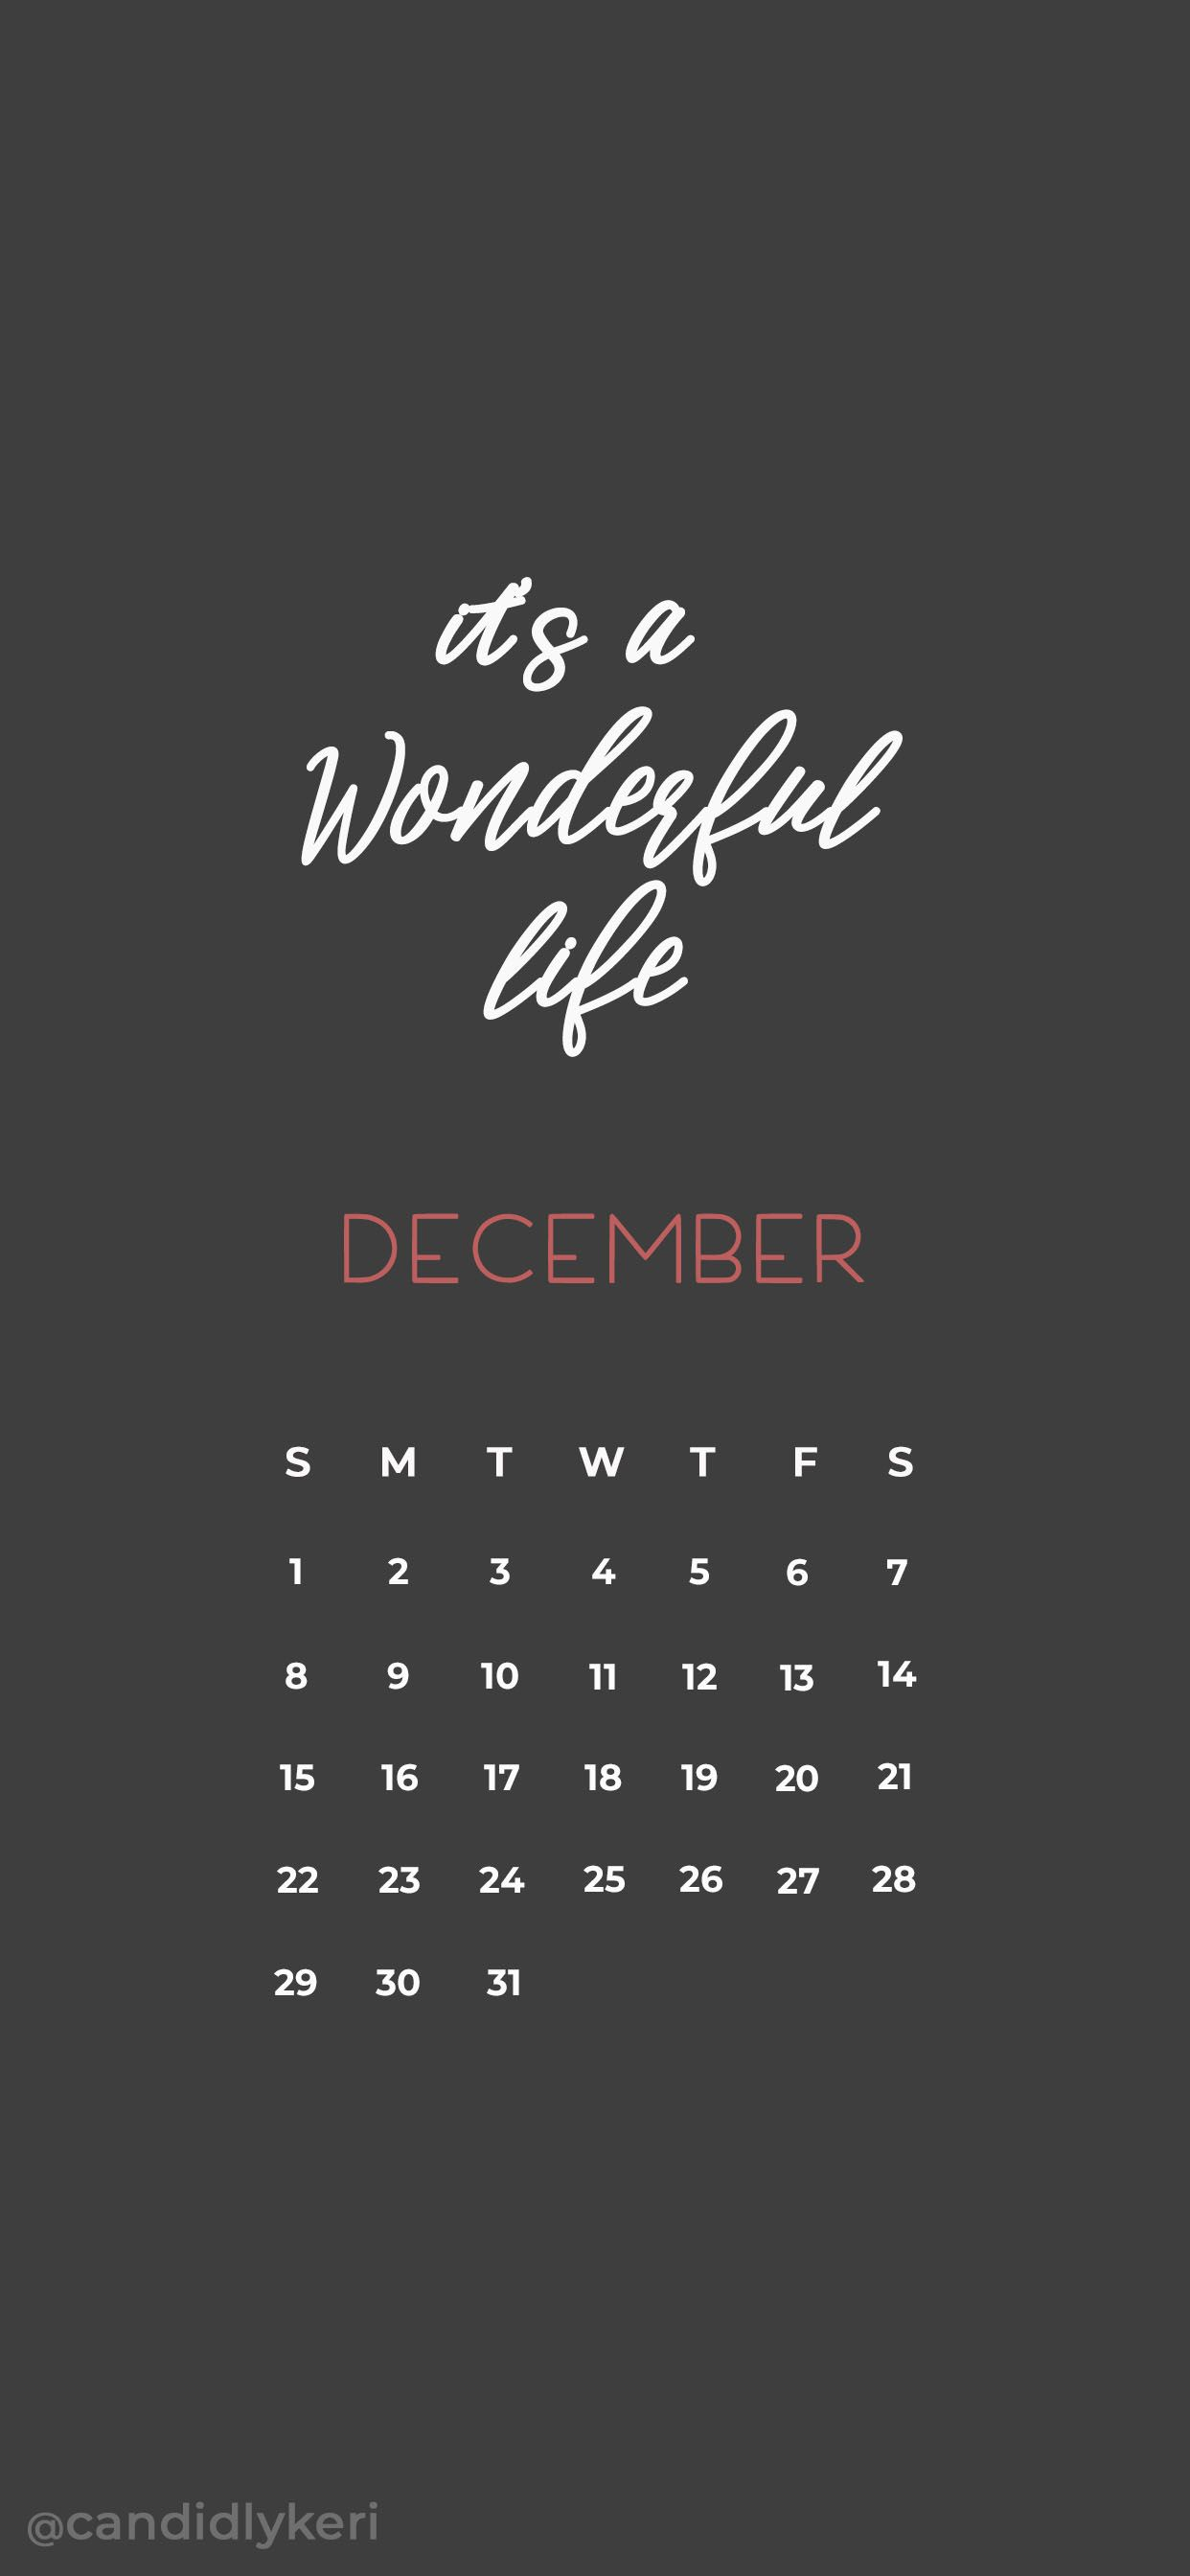 Its A Wonderful Life December Calendar 2019 Wallpaper You Can